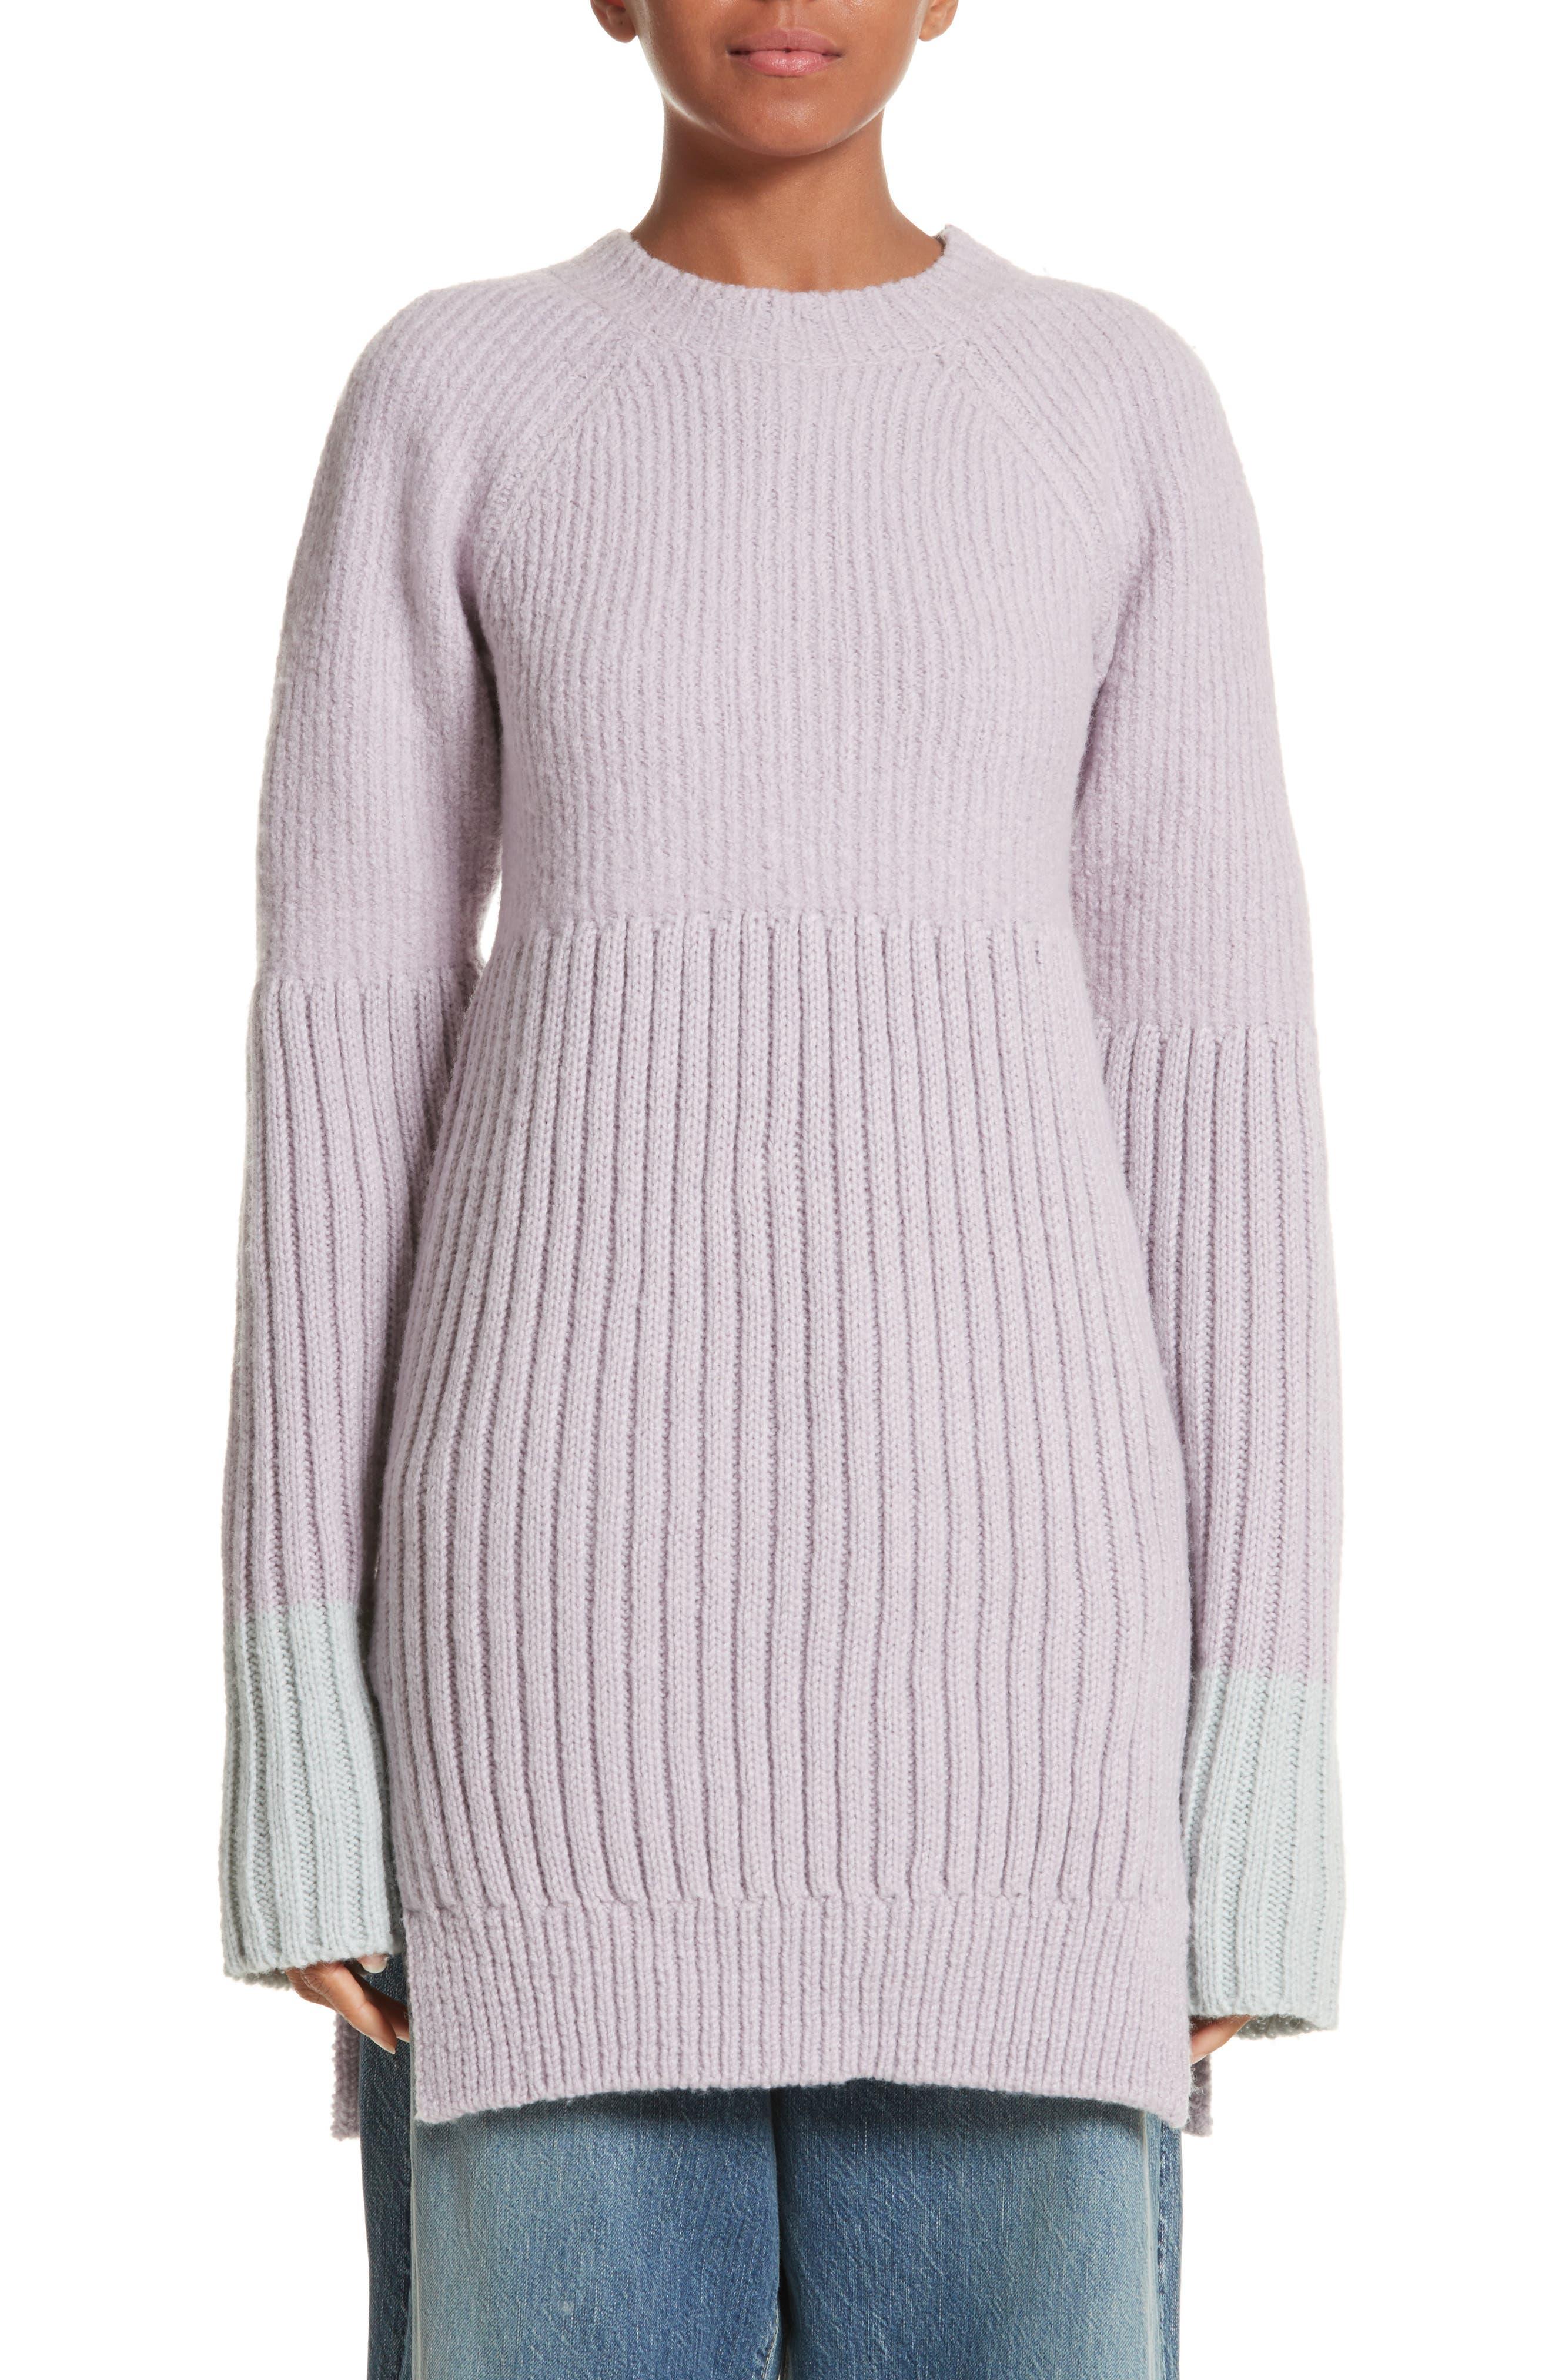 Wool Tunic Sweater,                             Main thumbnail 1, color,                             Lavendar